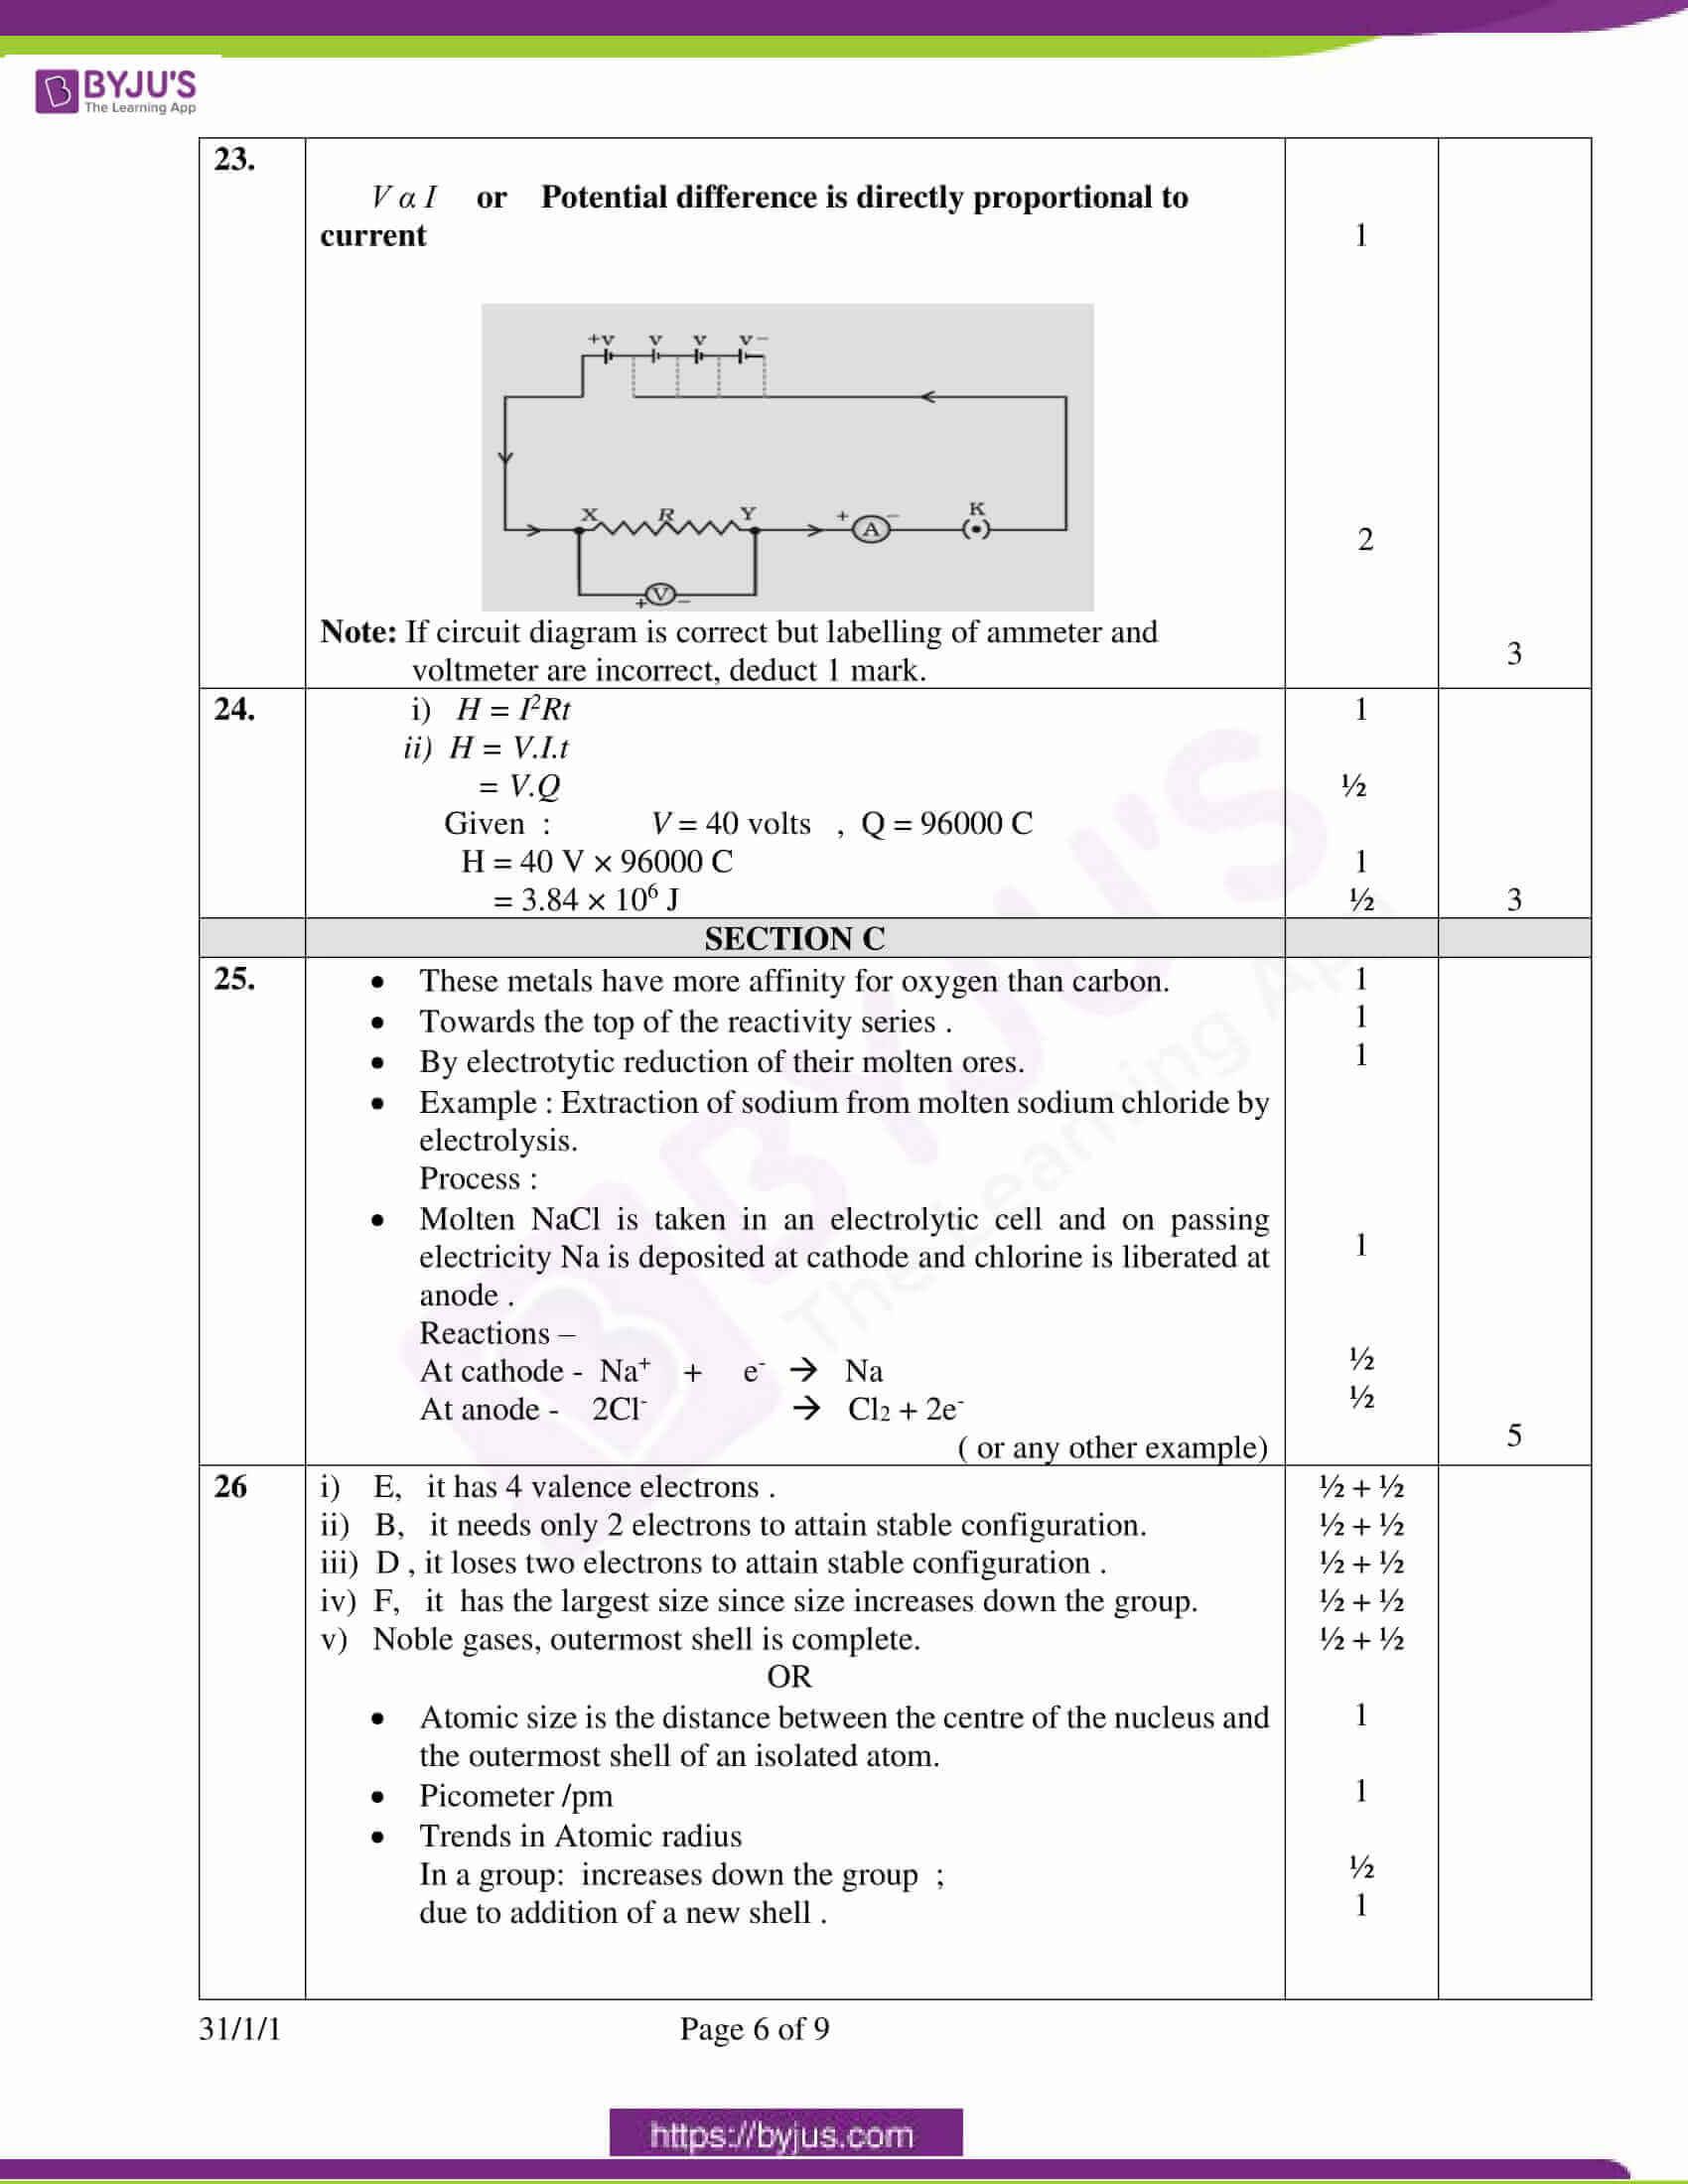 cbse class 10 science question paper set 3 solution 2020 4